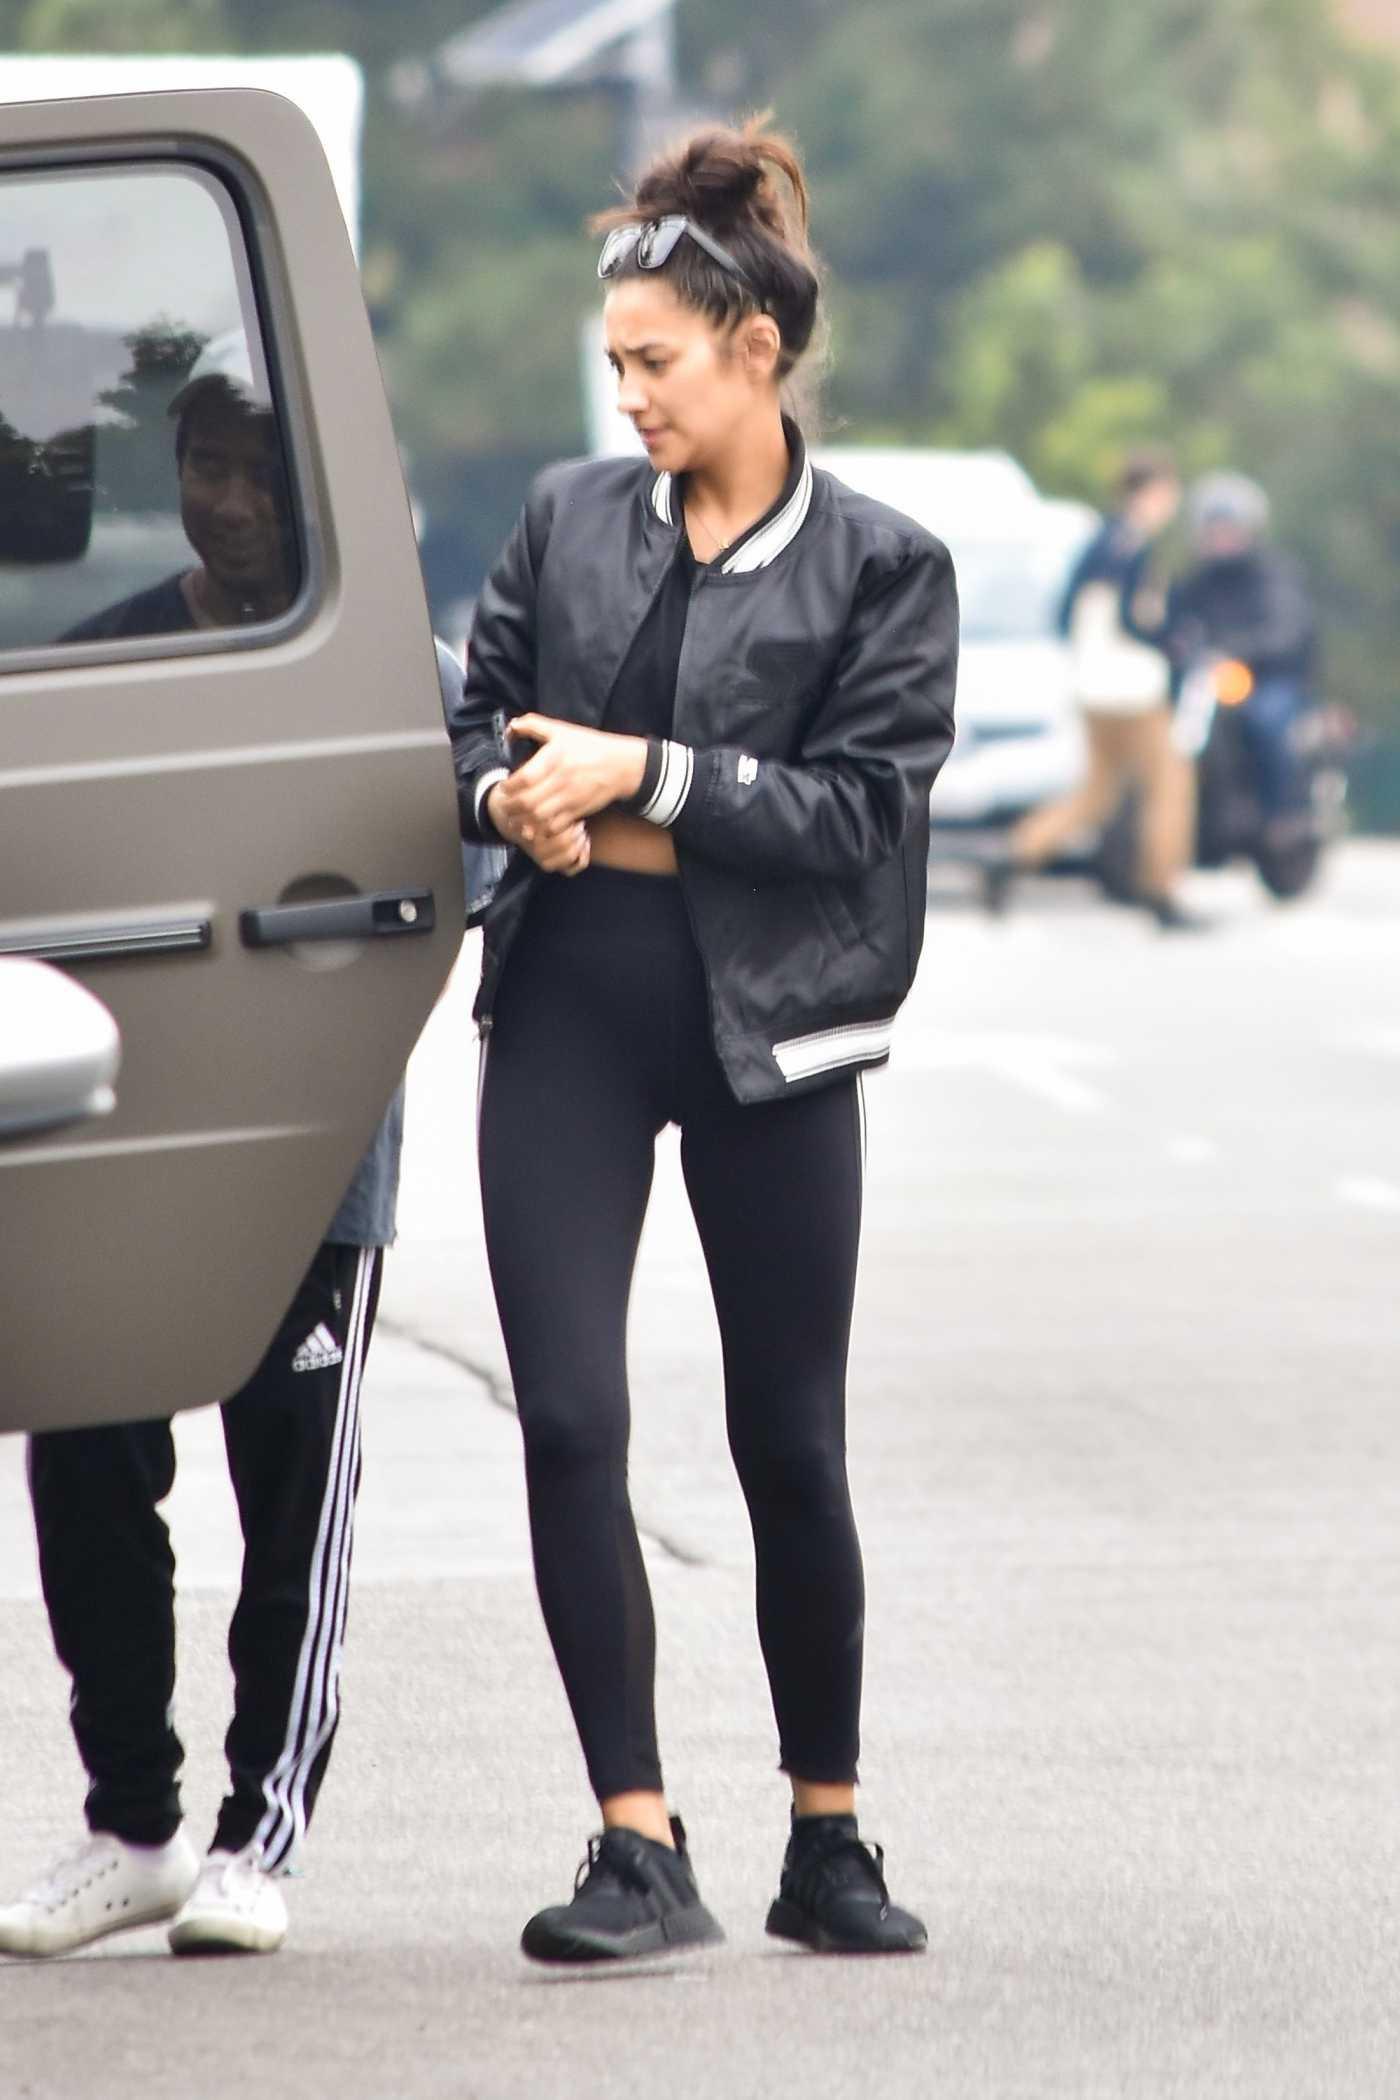 Shay Mitchell in a Black Leggings Was Seen Out in Los Feliz 01/20/2020